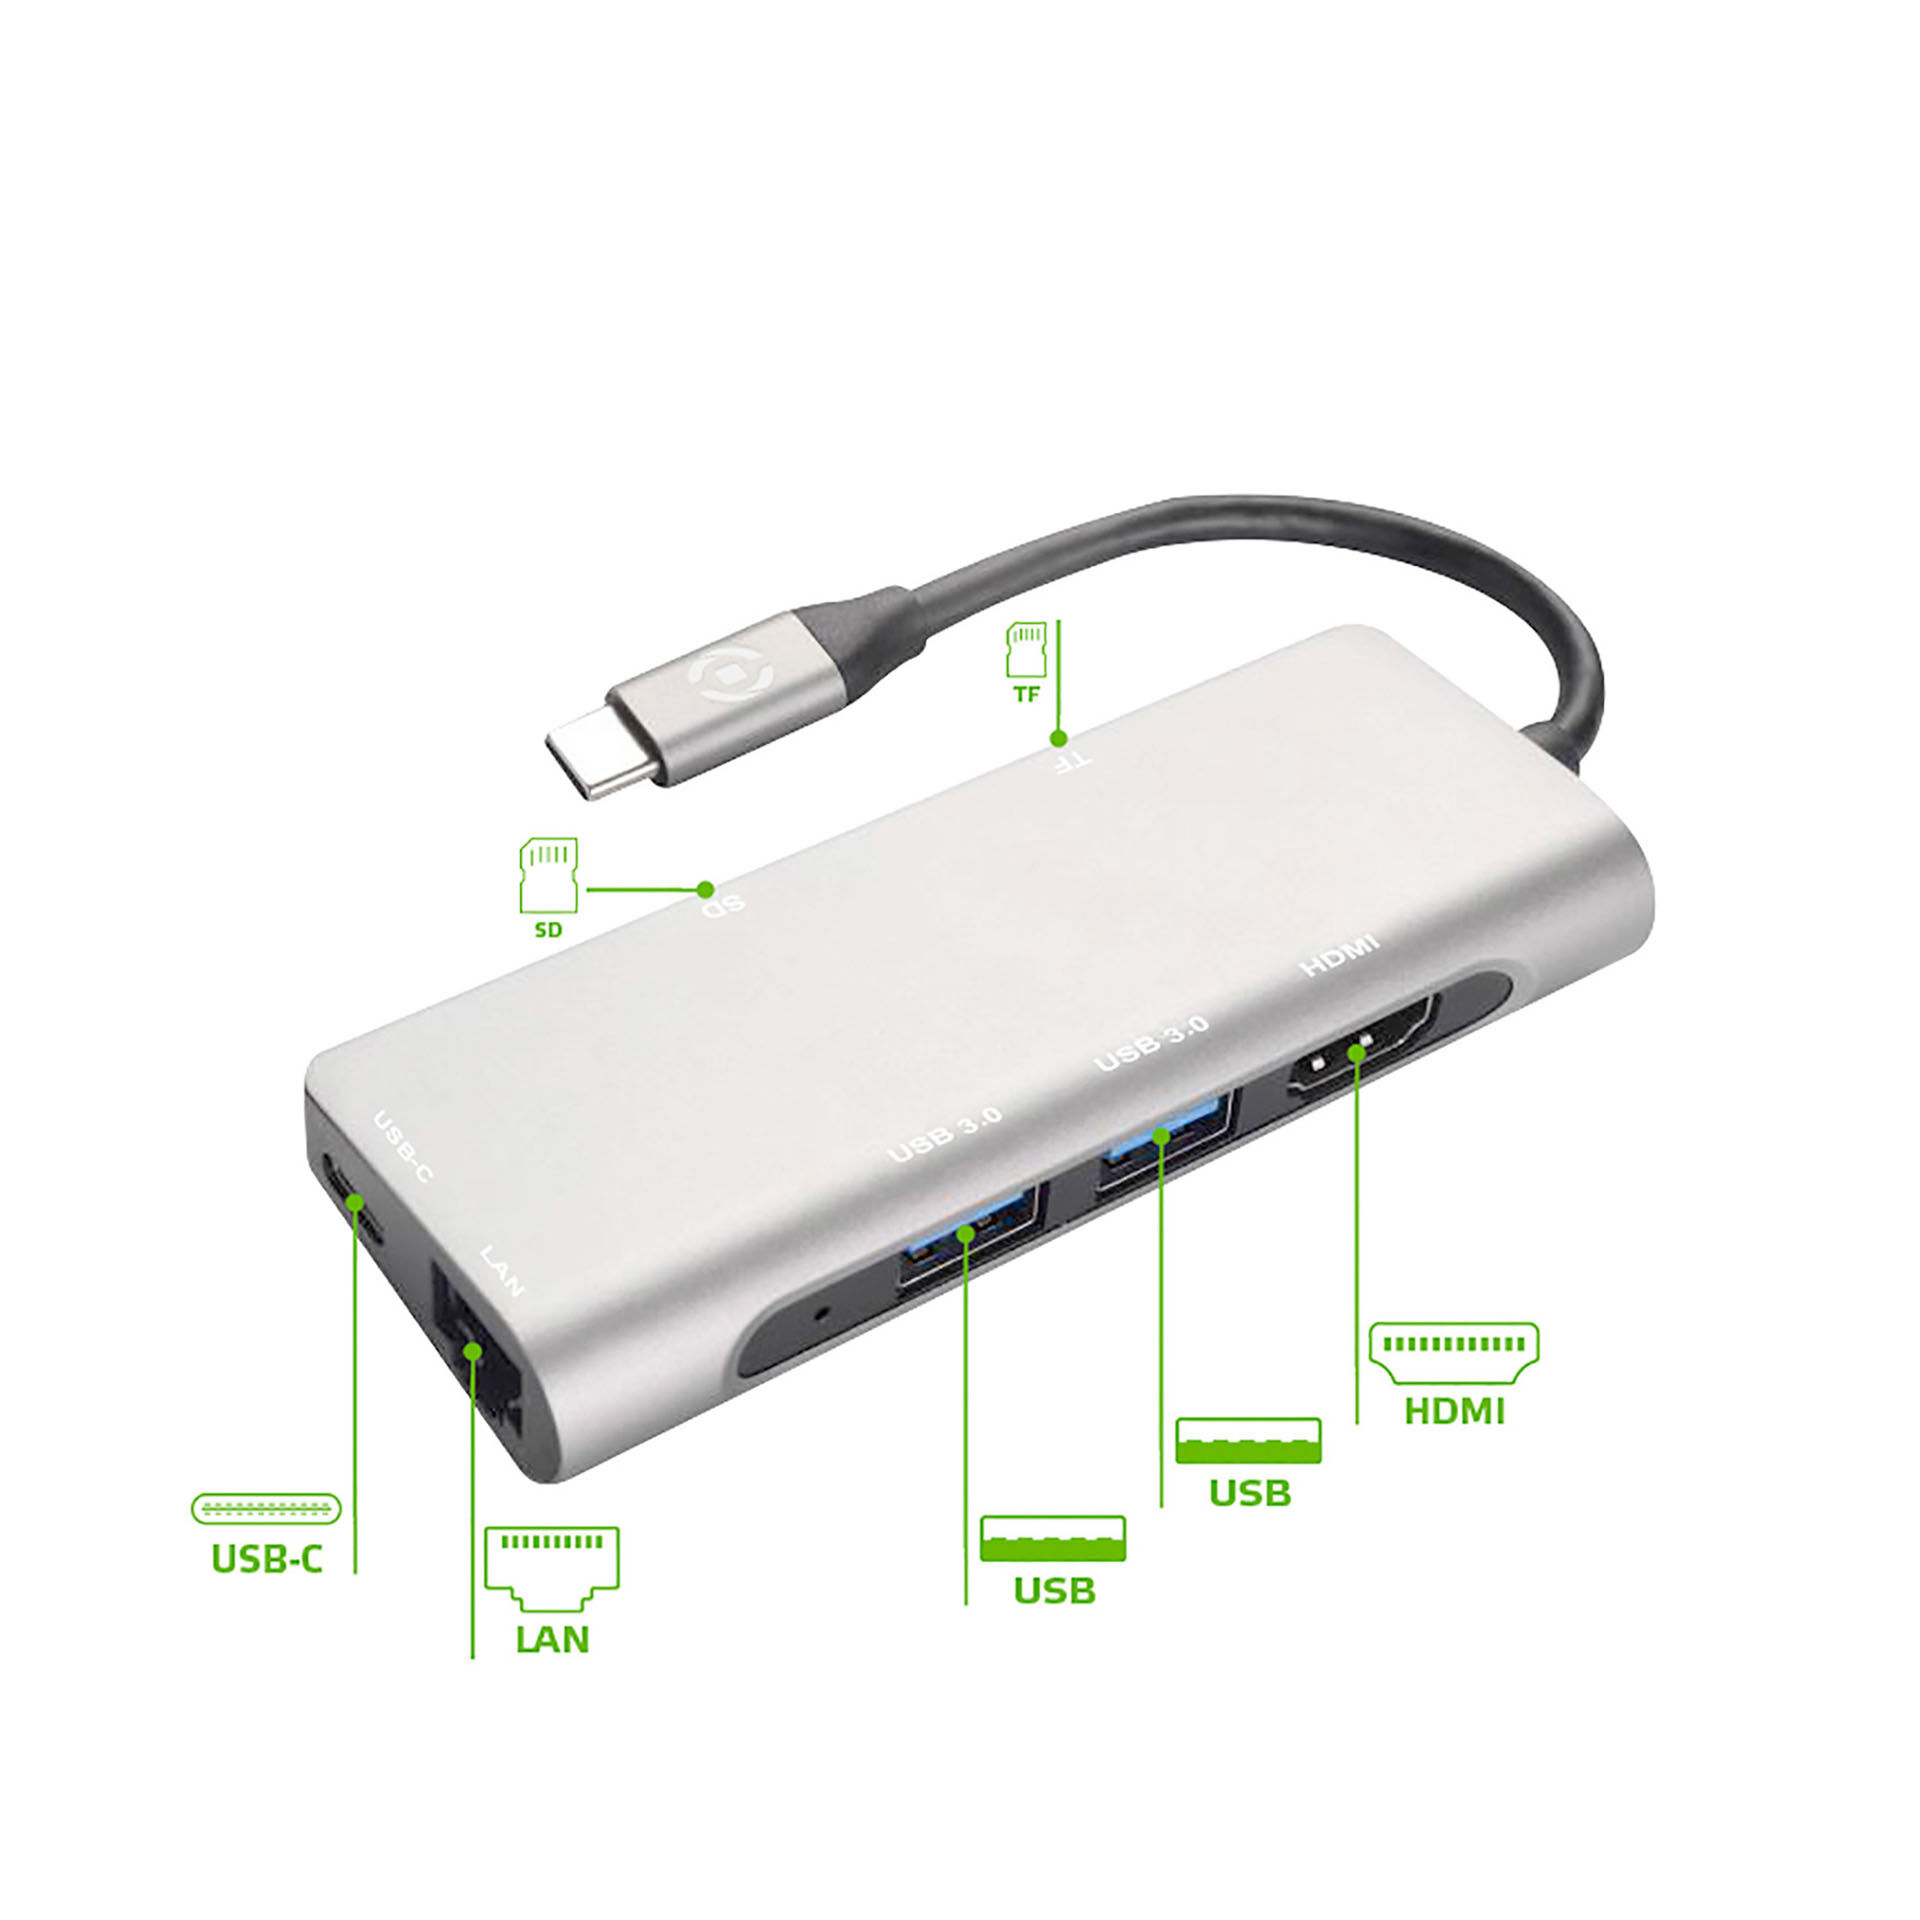 Adaptateur USB-C multiport, , large